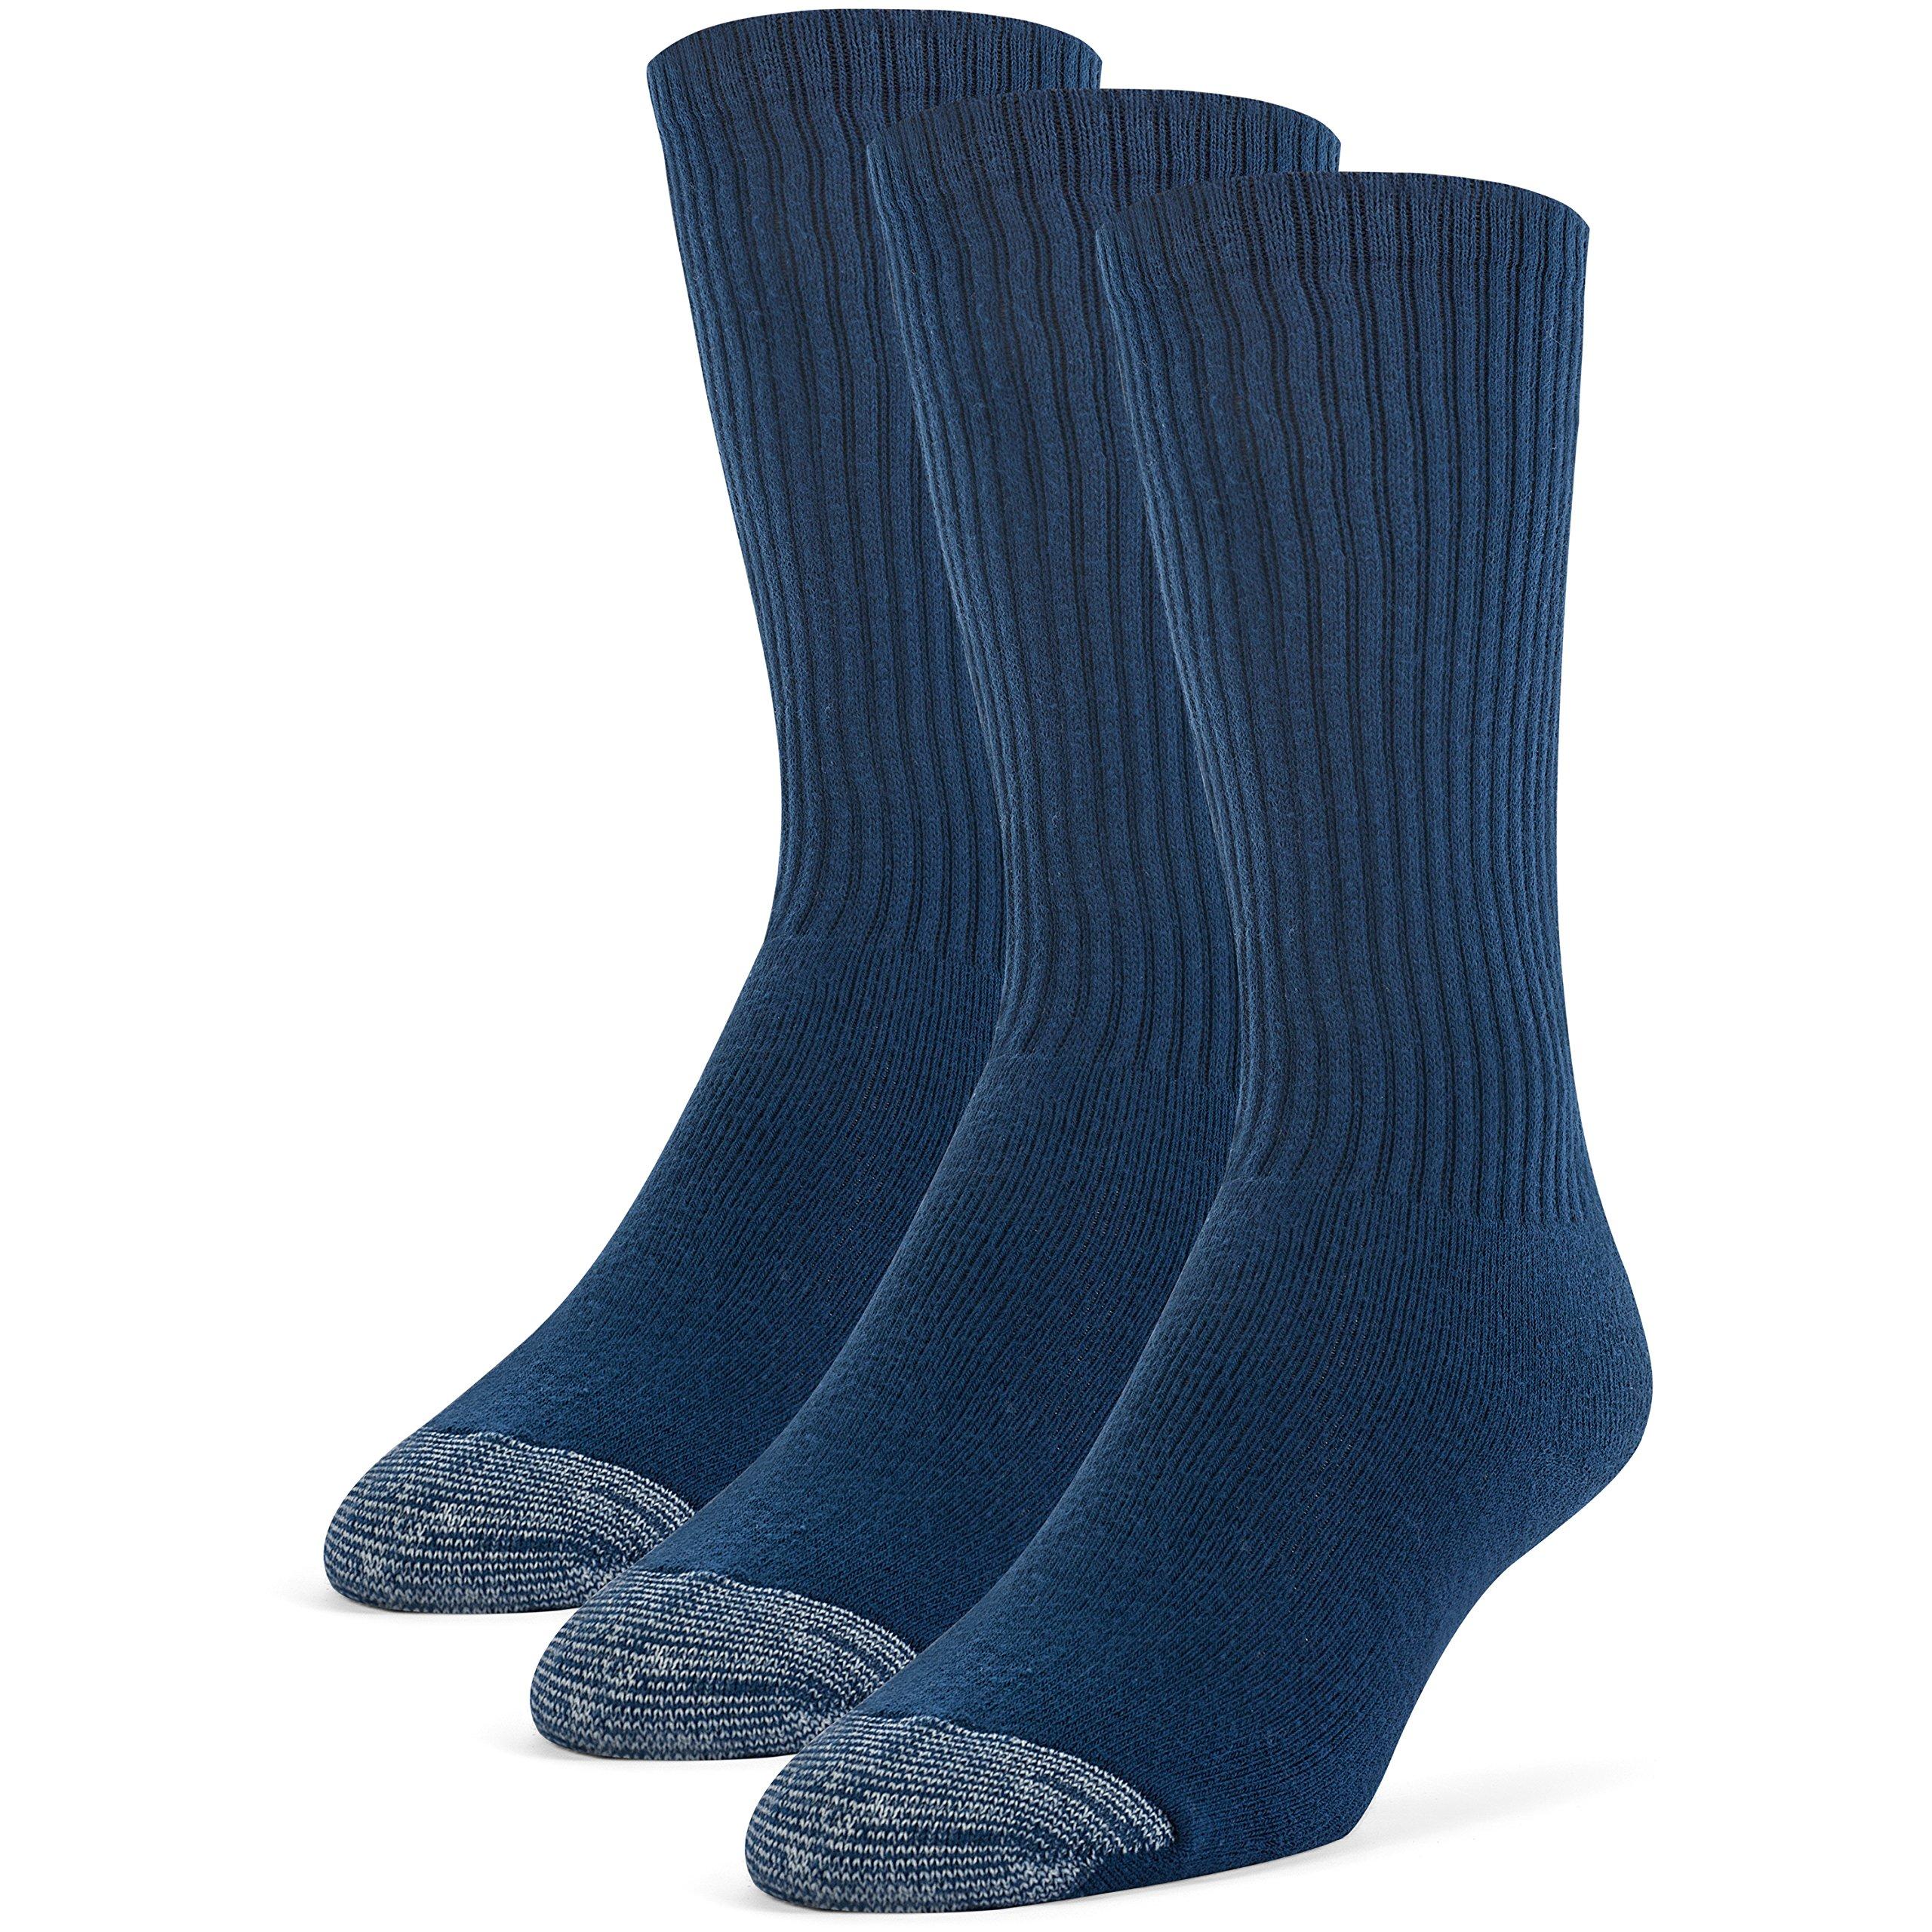 Galiva Men's Cotton Extra Soft Crew Cushion Socks - 3 Pairs, Large, Navy Blue by Galiva (Image #1)